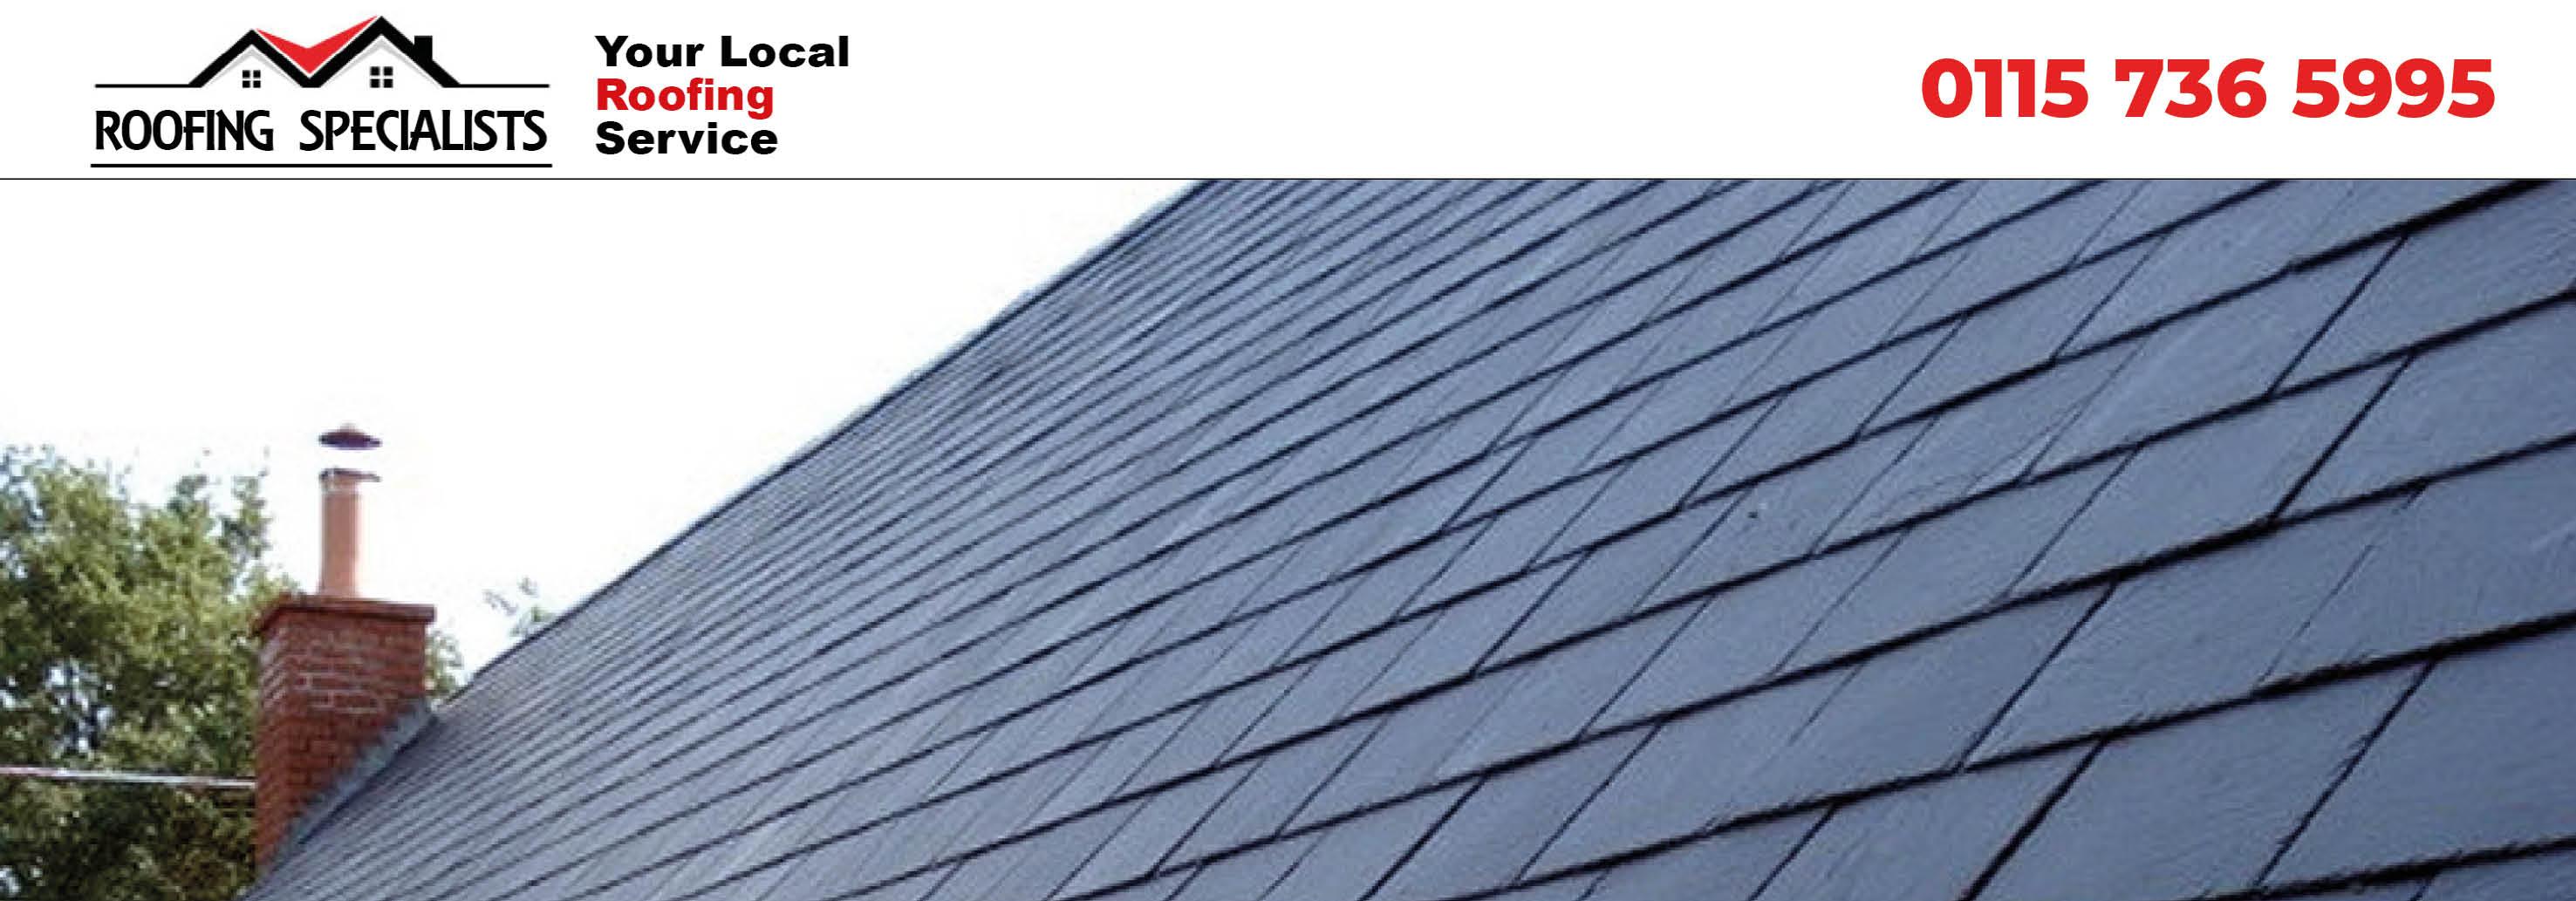 nottingham roofing company header image